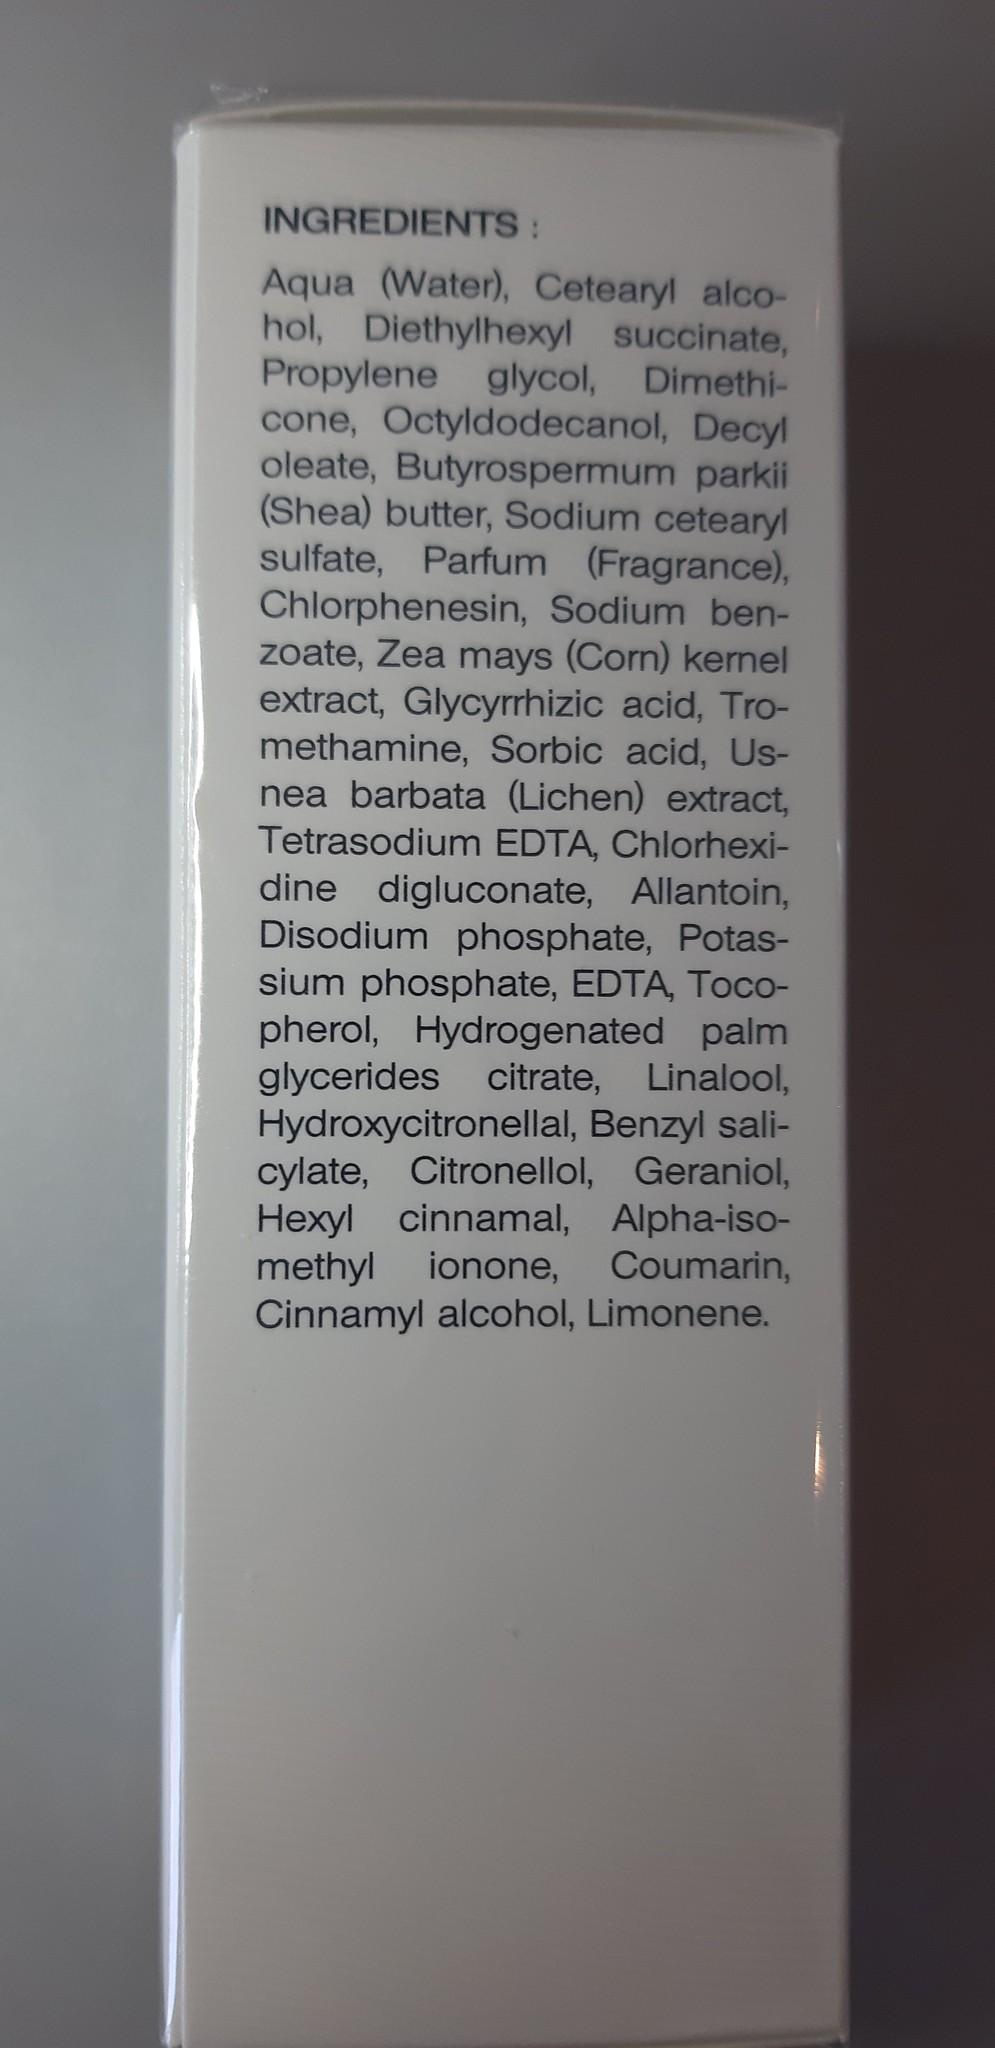 Sothys Sothys Crème Reparatrice voor de vette huid